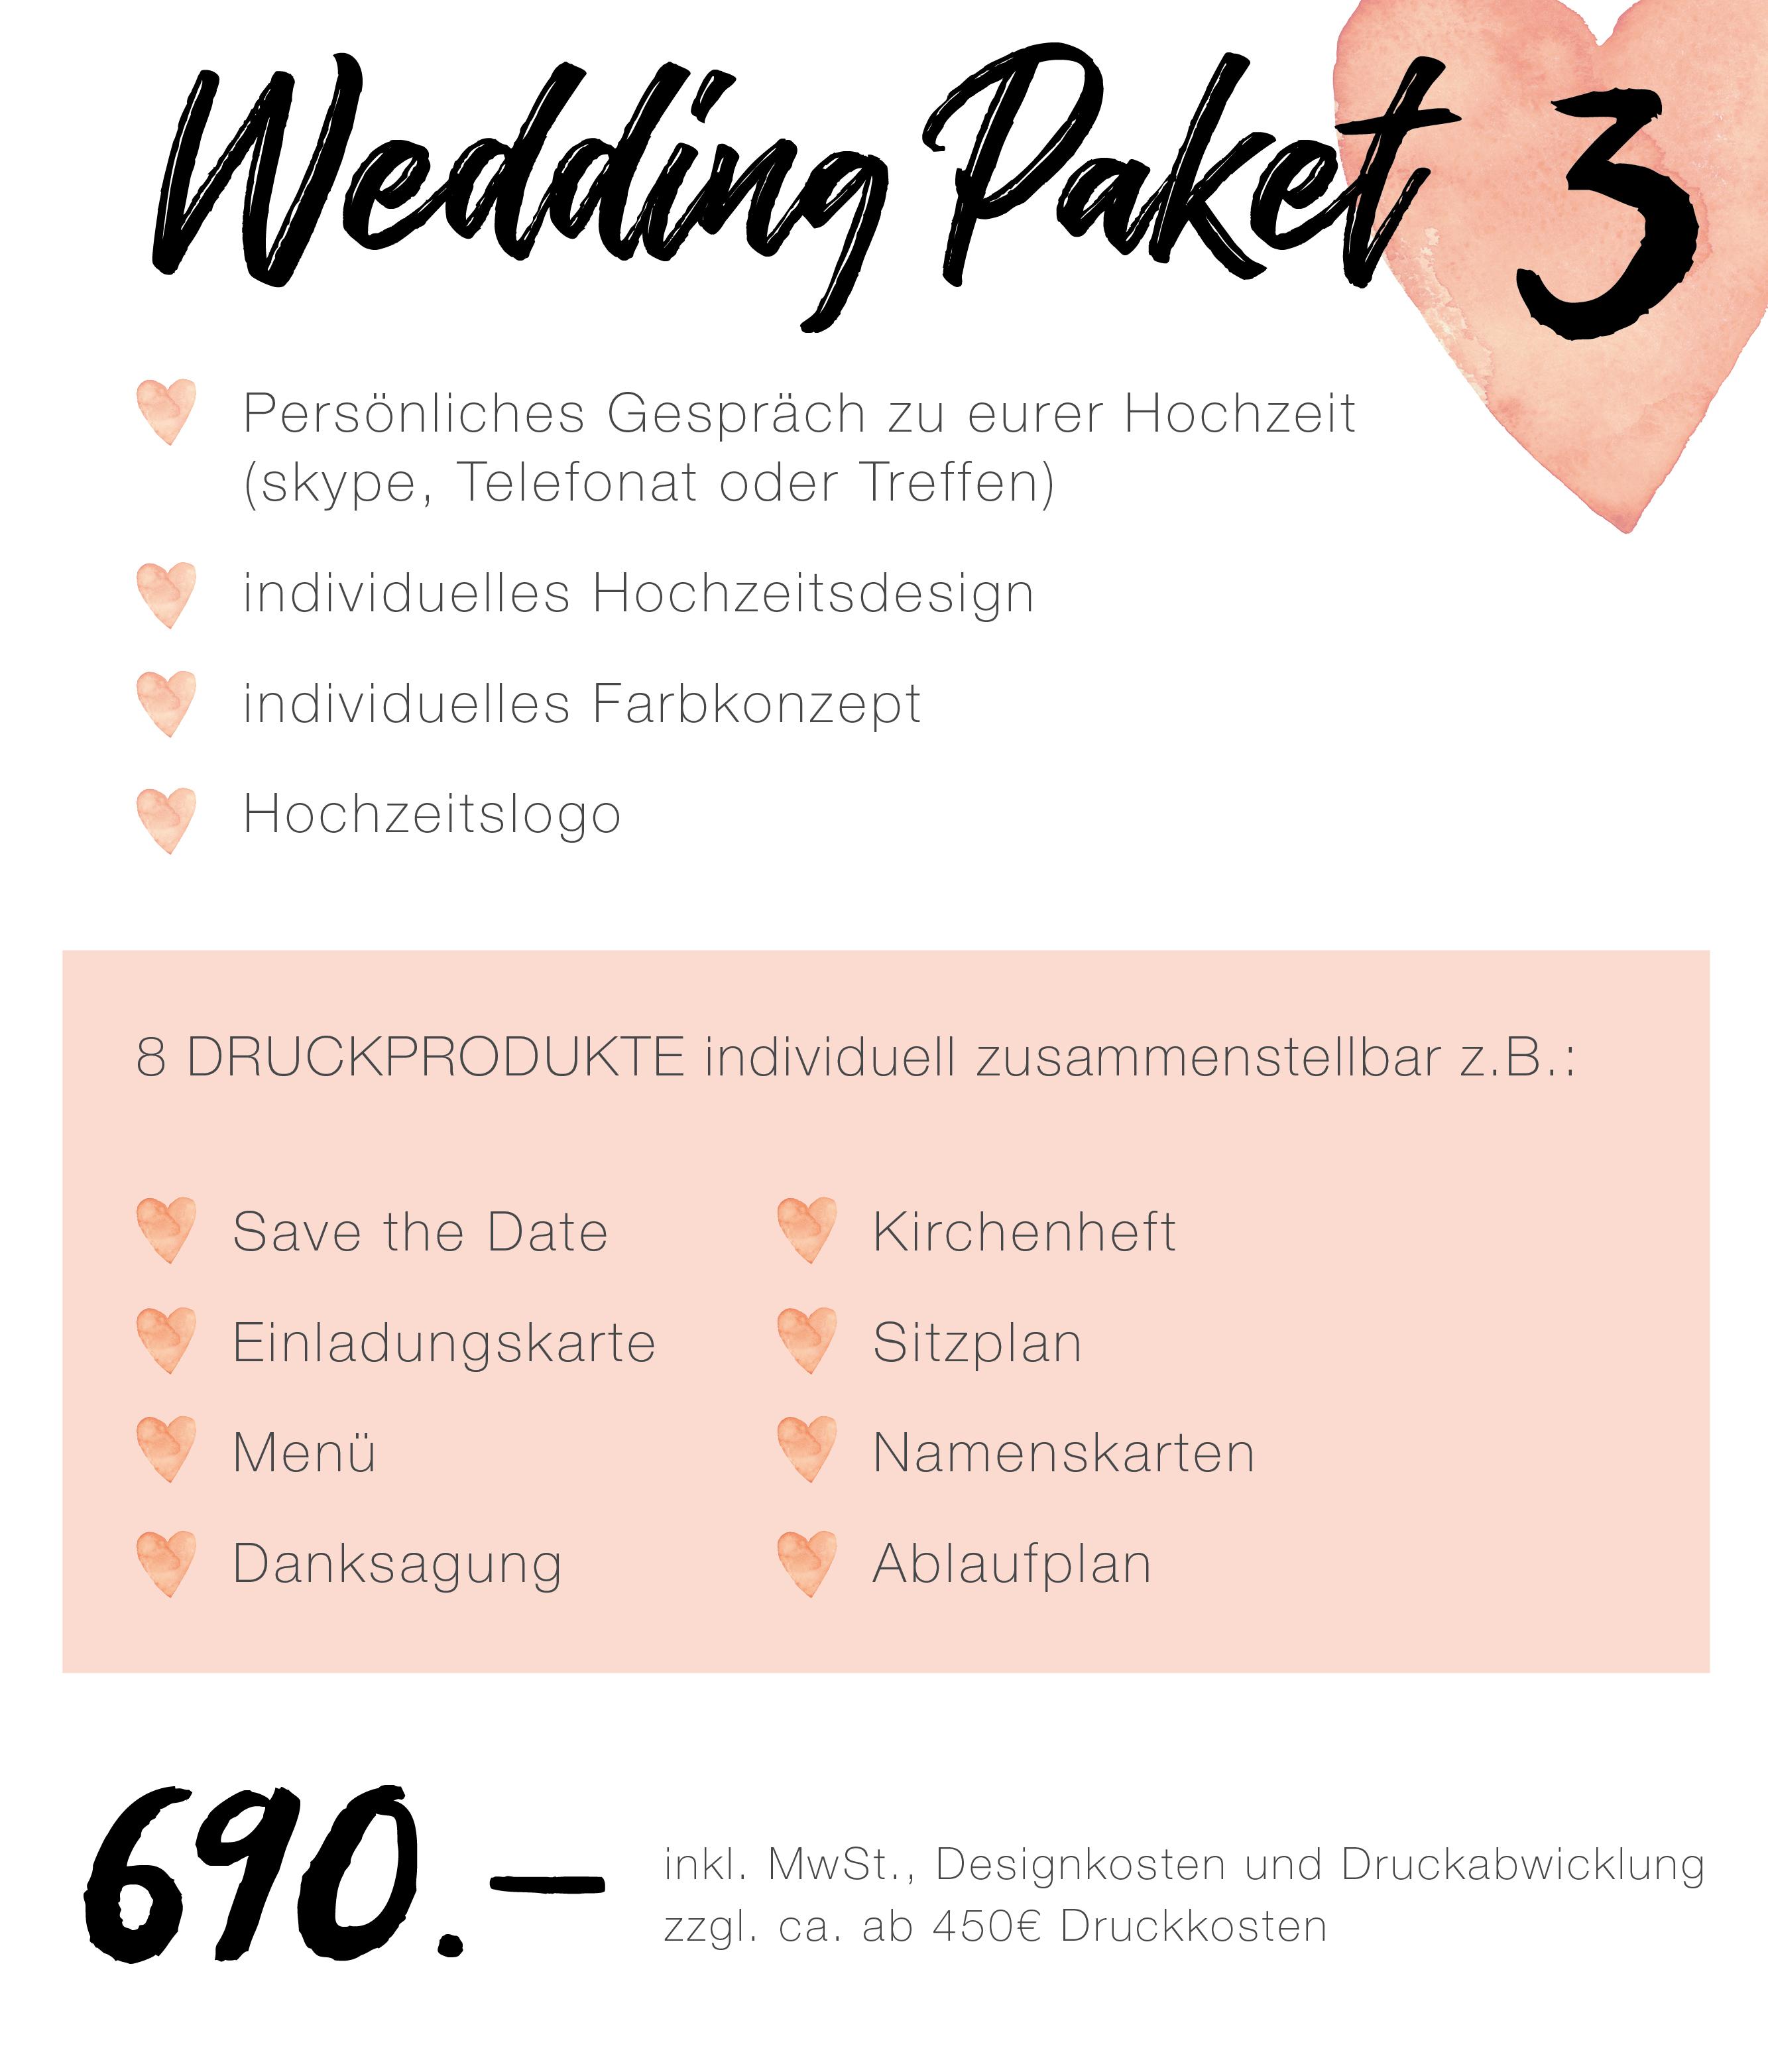 confettiandcream wedding paket 3